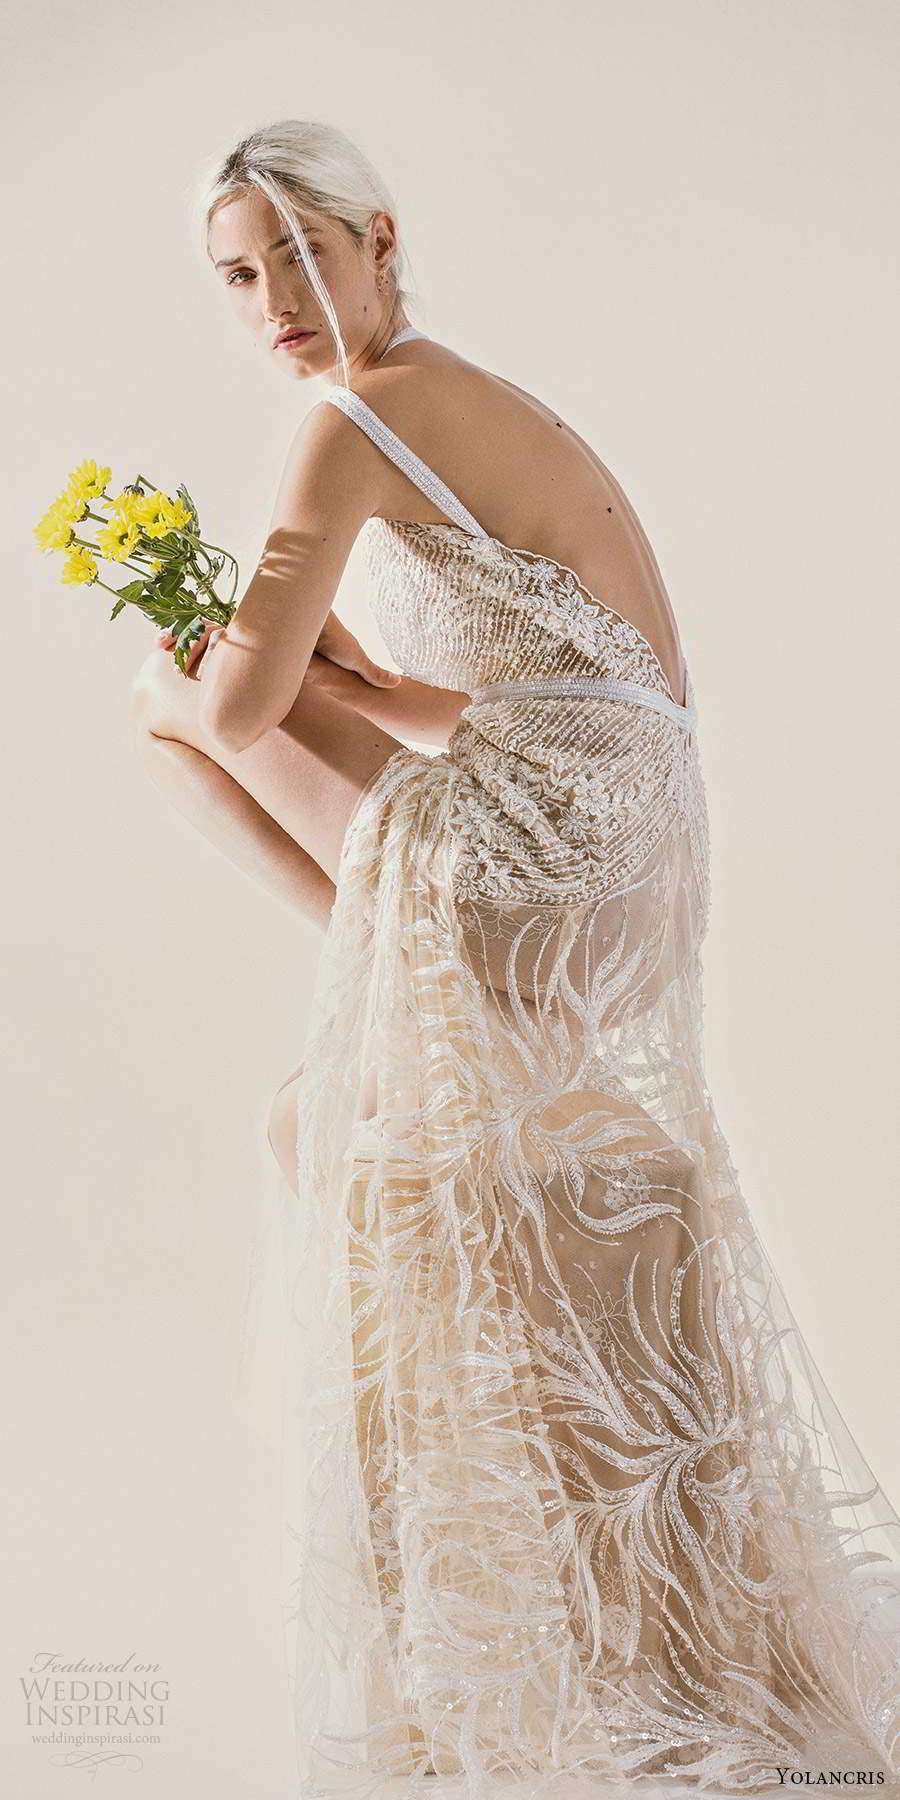 yolancris 2021 bridal sleeveless double straps v neckline fully embellished sheath wedding dress chapel train (3) zsv